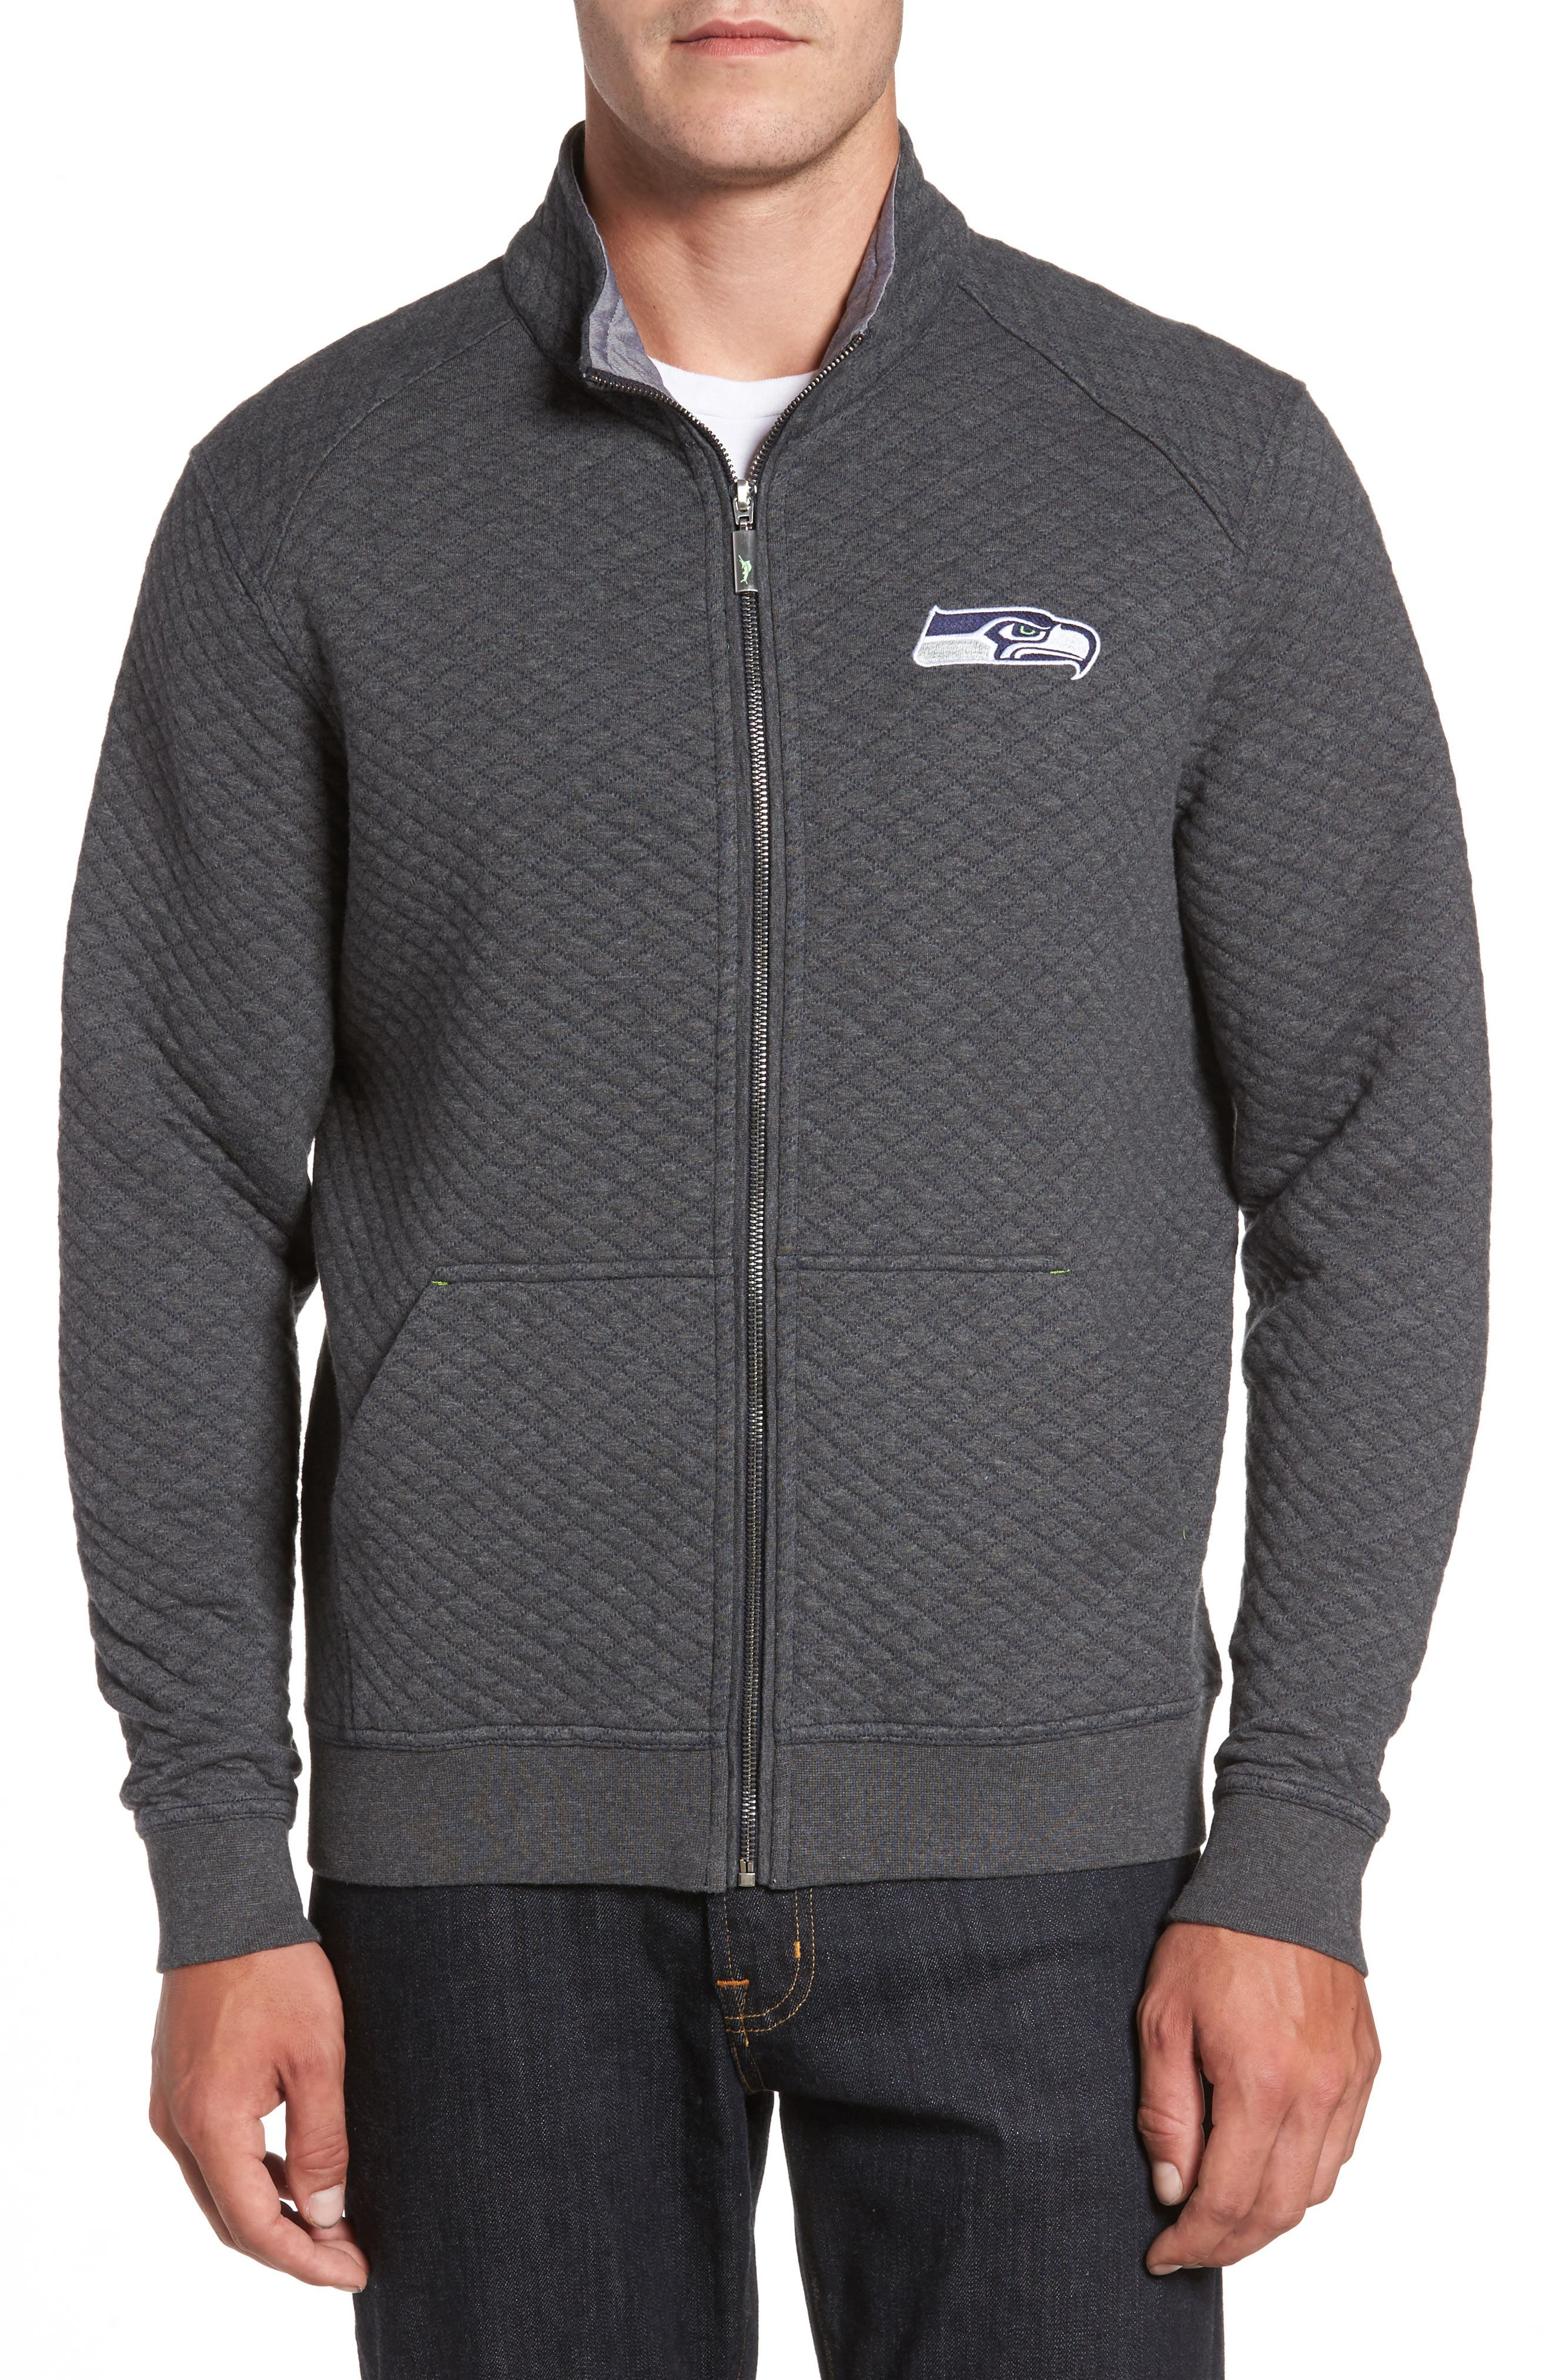 Tommy Bahama NFL Quiltessential Full Zip Sweatshirt